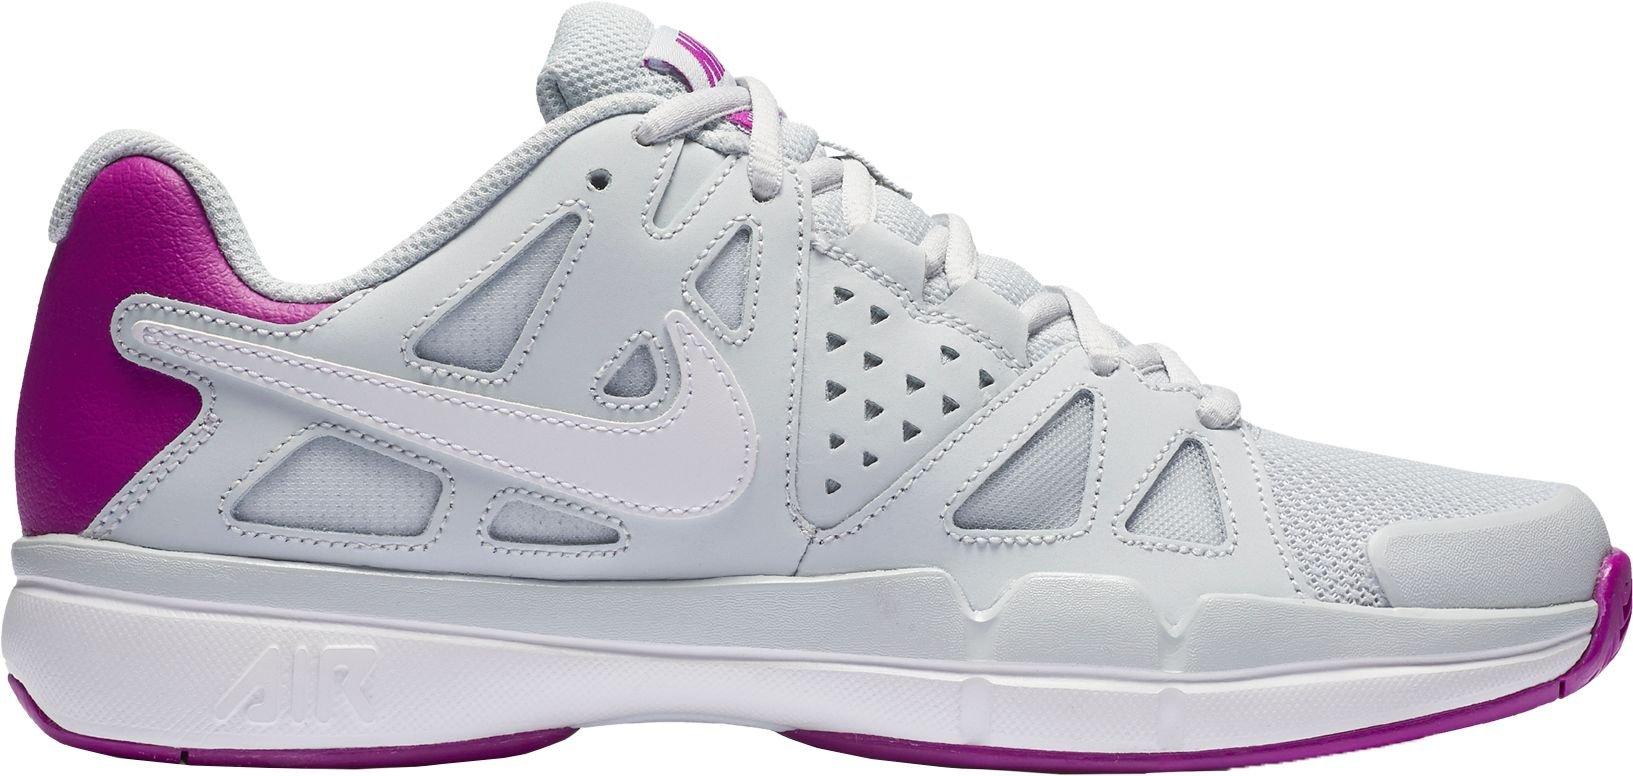 Nike Women's Air Vapor Advantage Tennis Shoe (Grey/Purple, 7)